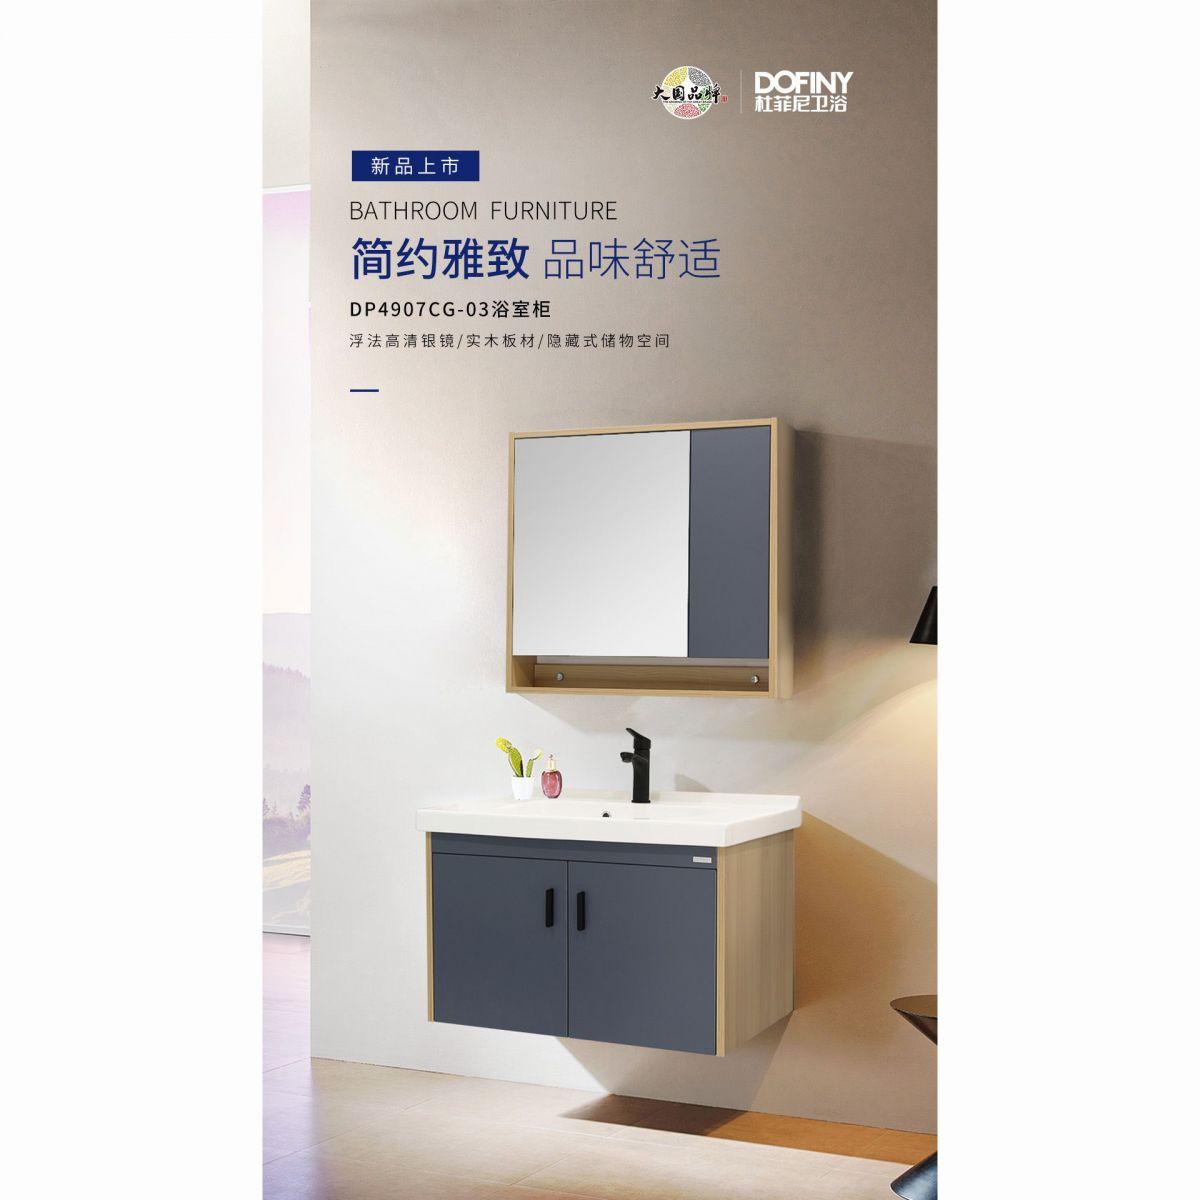 DP4907CG-03-浴室柜